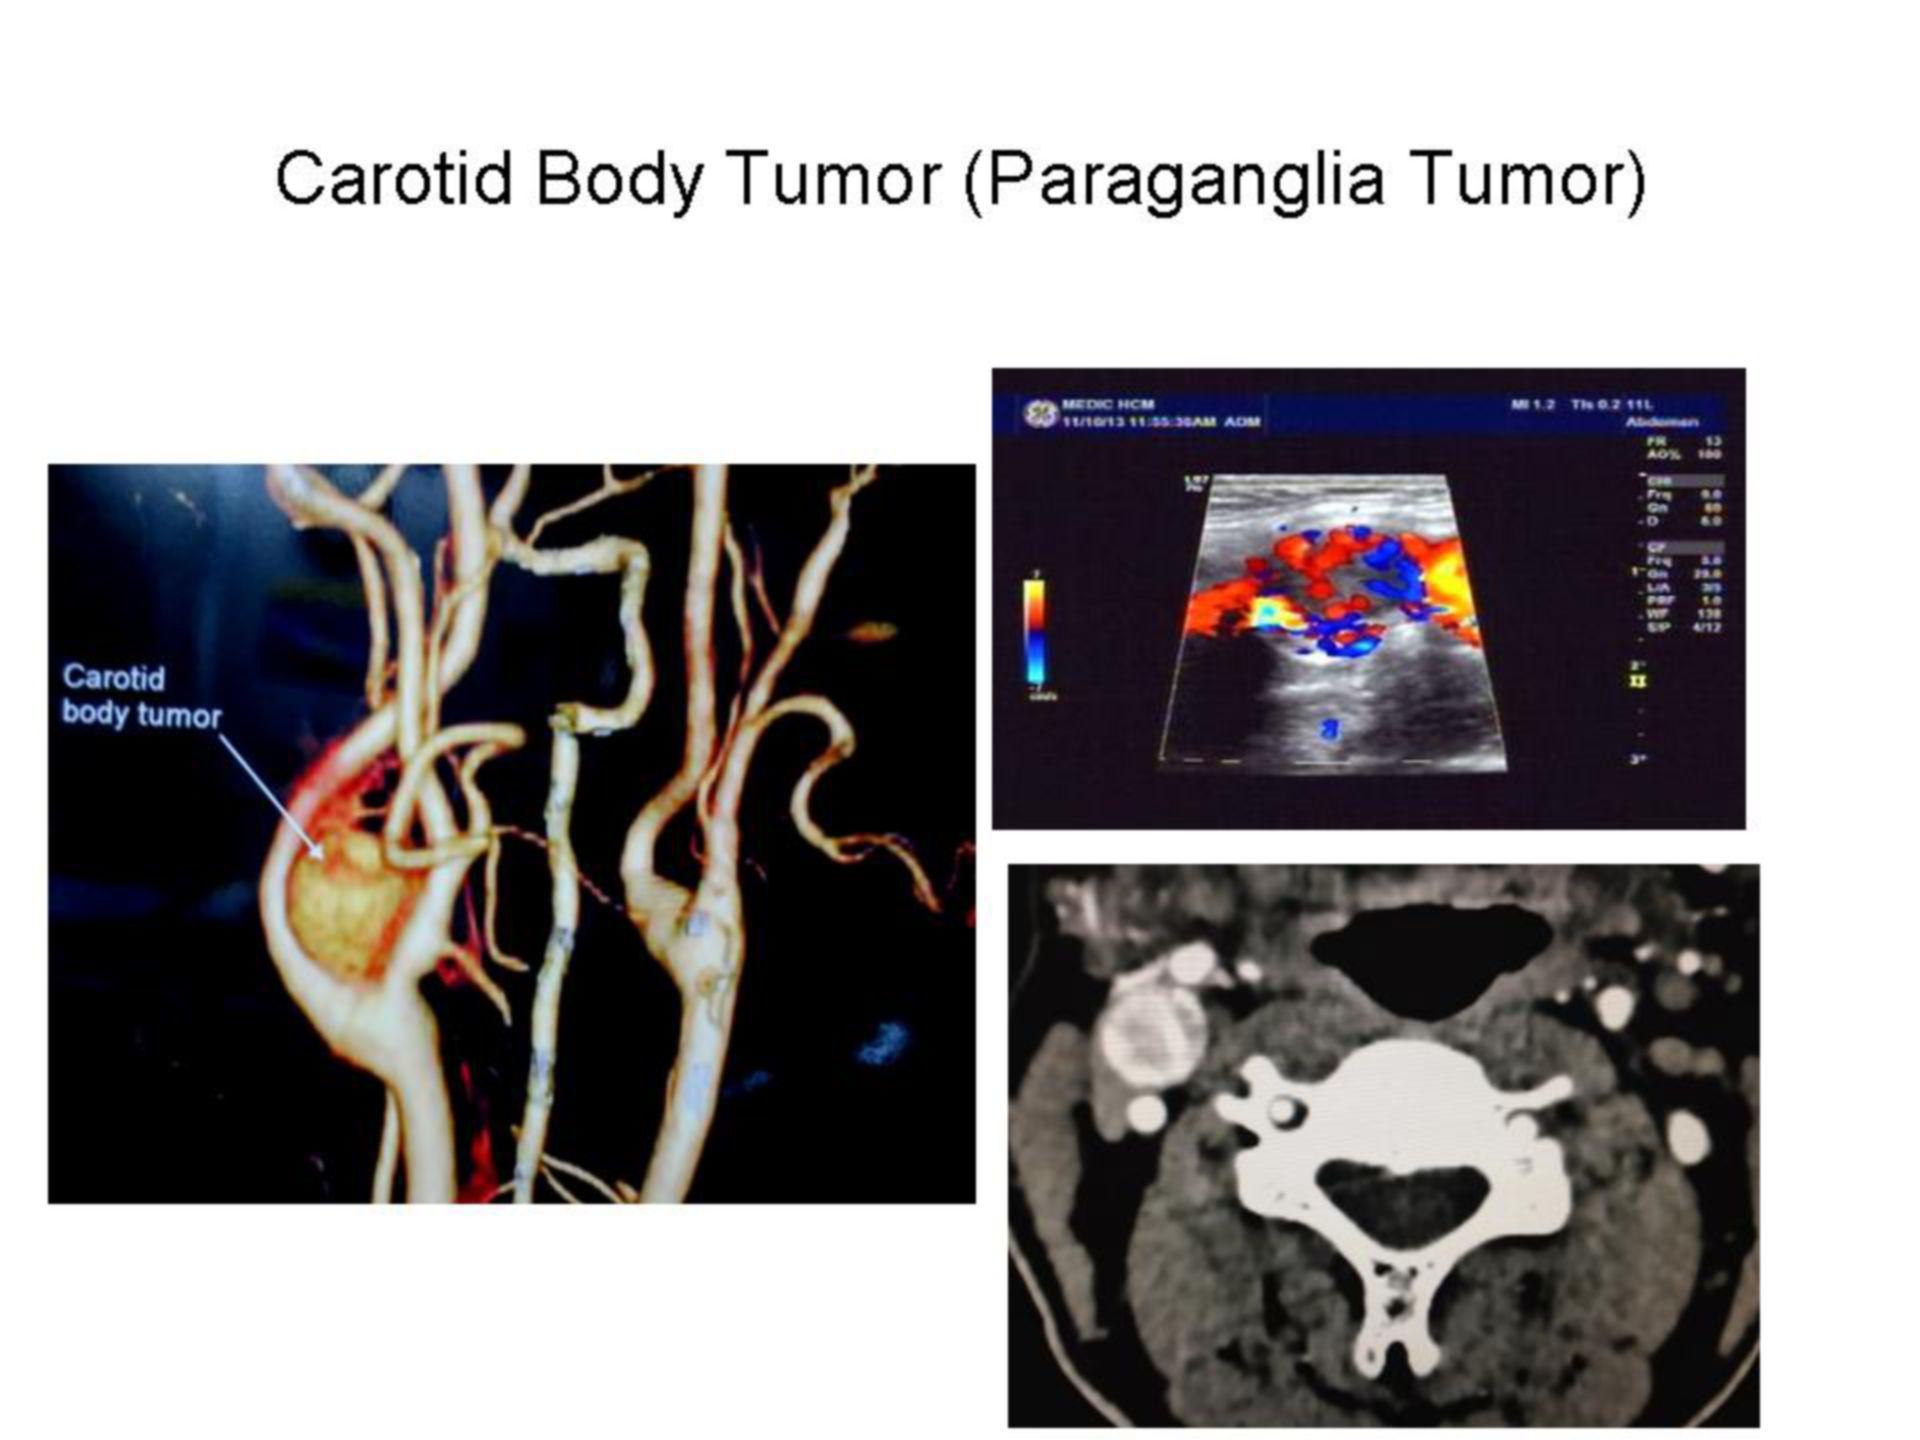 Carotid Body Tumor